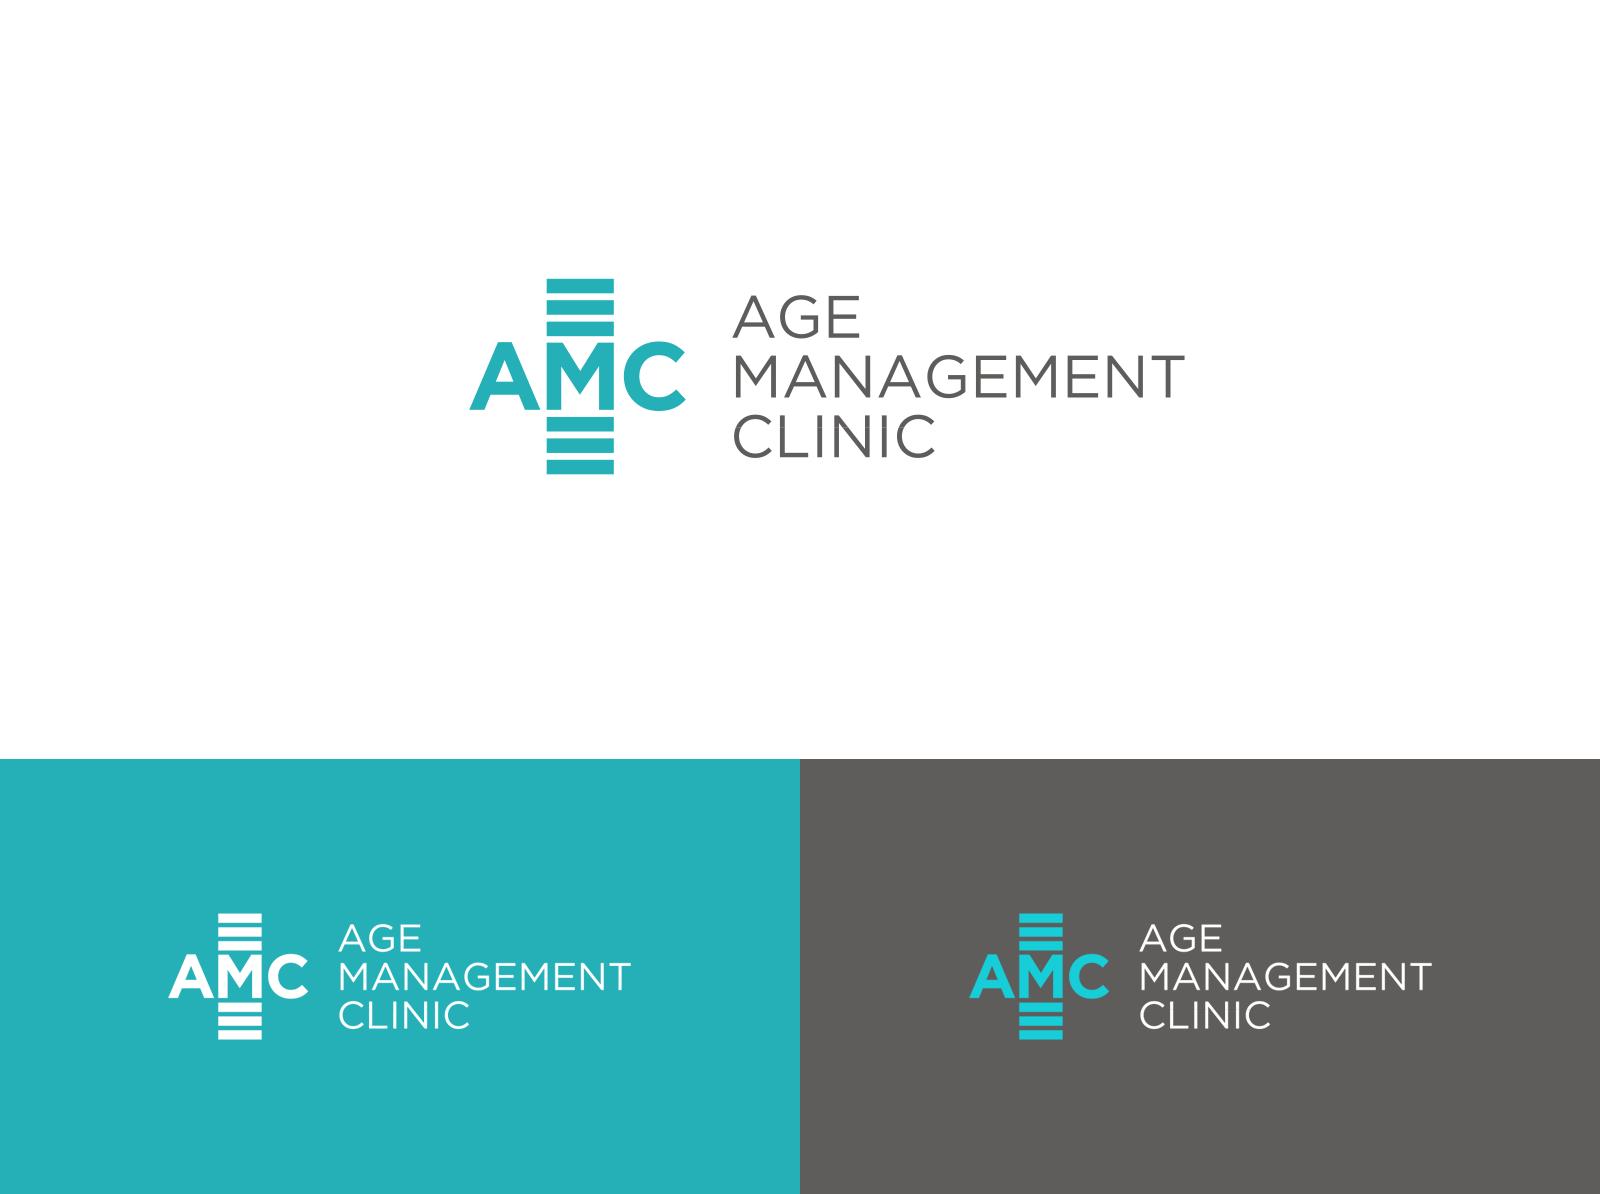 Логотип для медицинского центра (клиники)  фото f_3815b99415927856.png